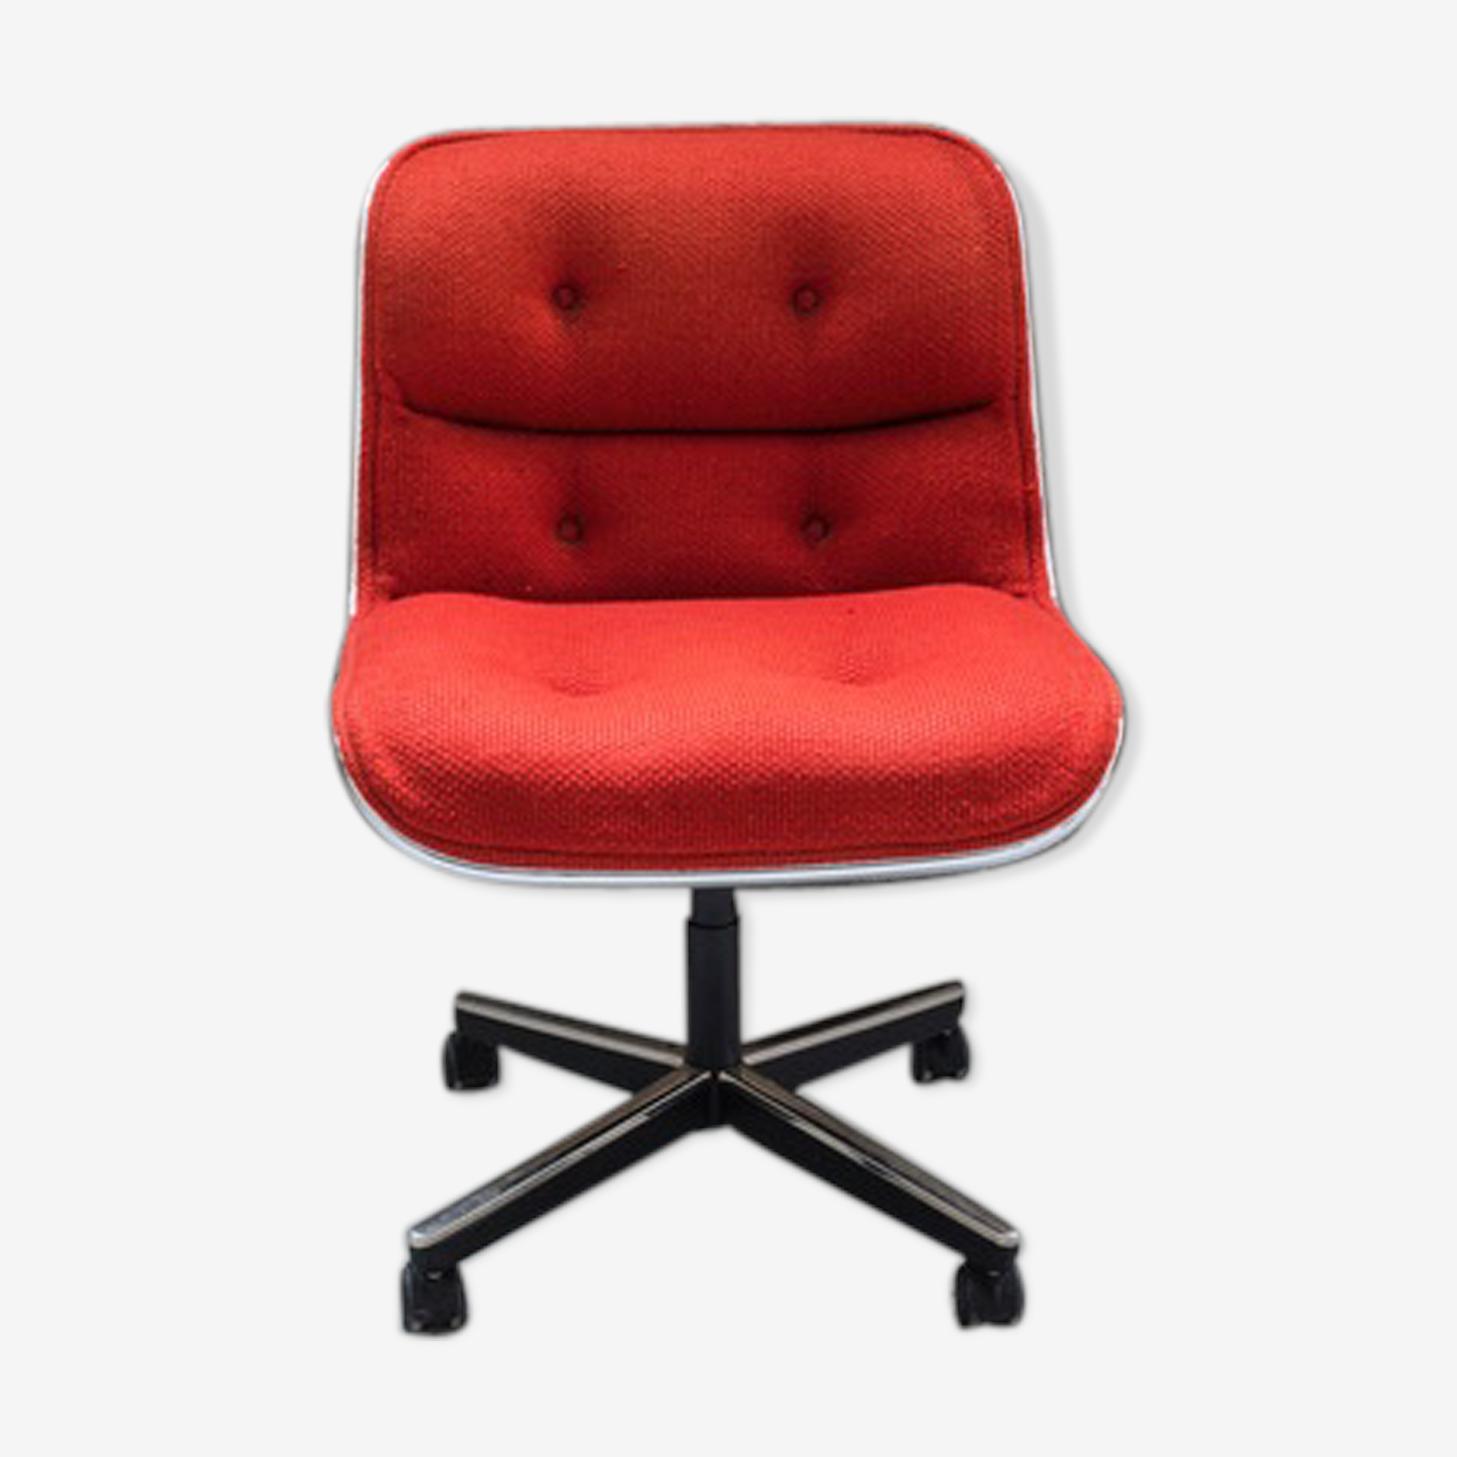 Chair Charles Pollock